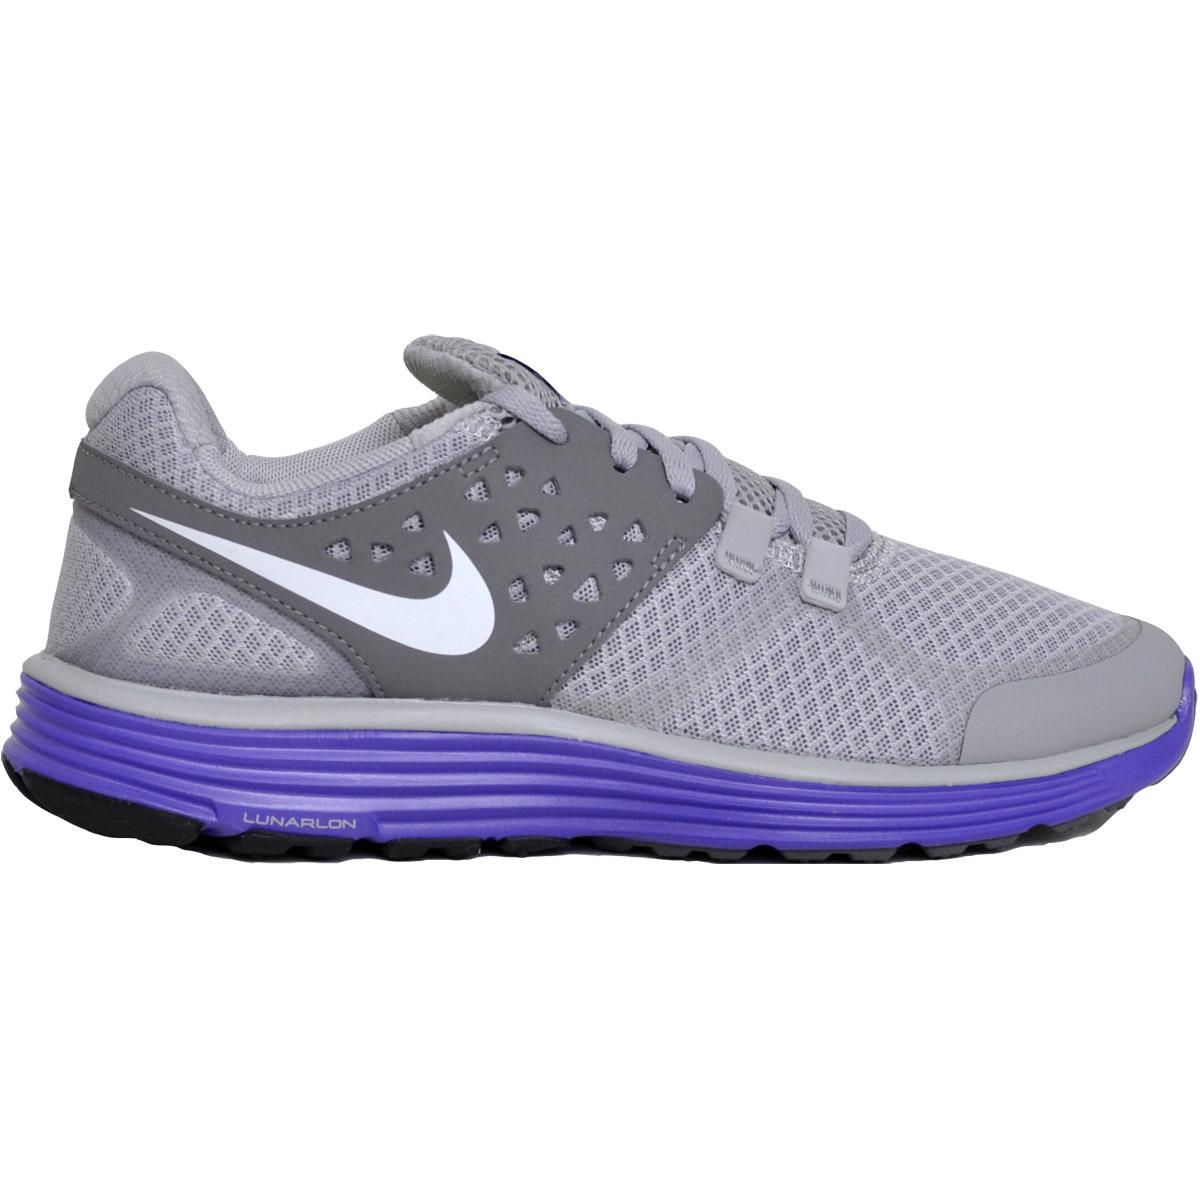 índice Culpable Grapa  Nike LunarSwift 3 - Grey - Woman | LEPAPE